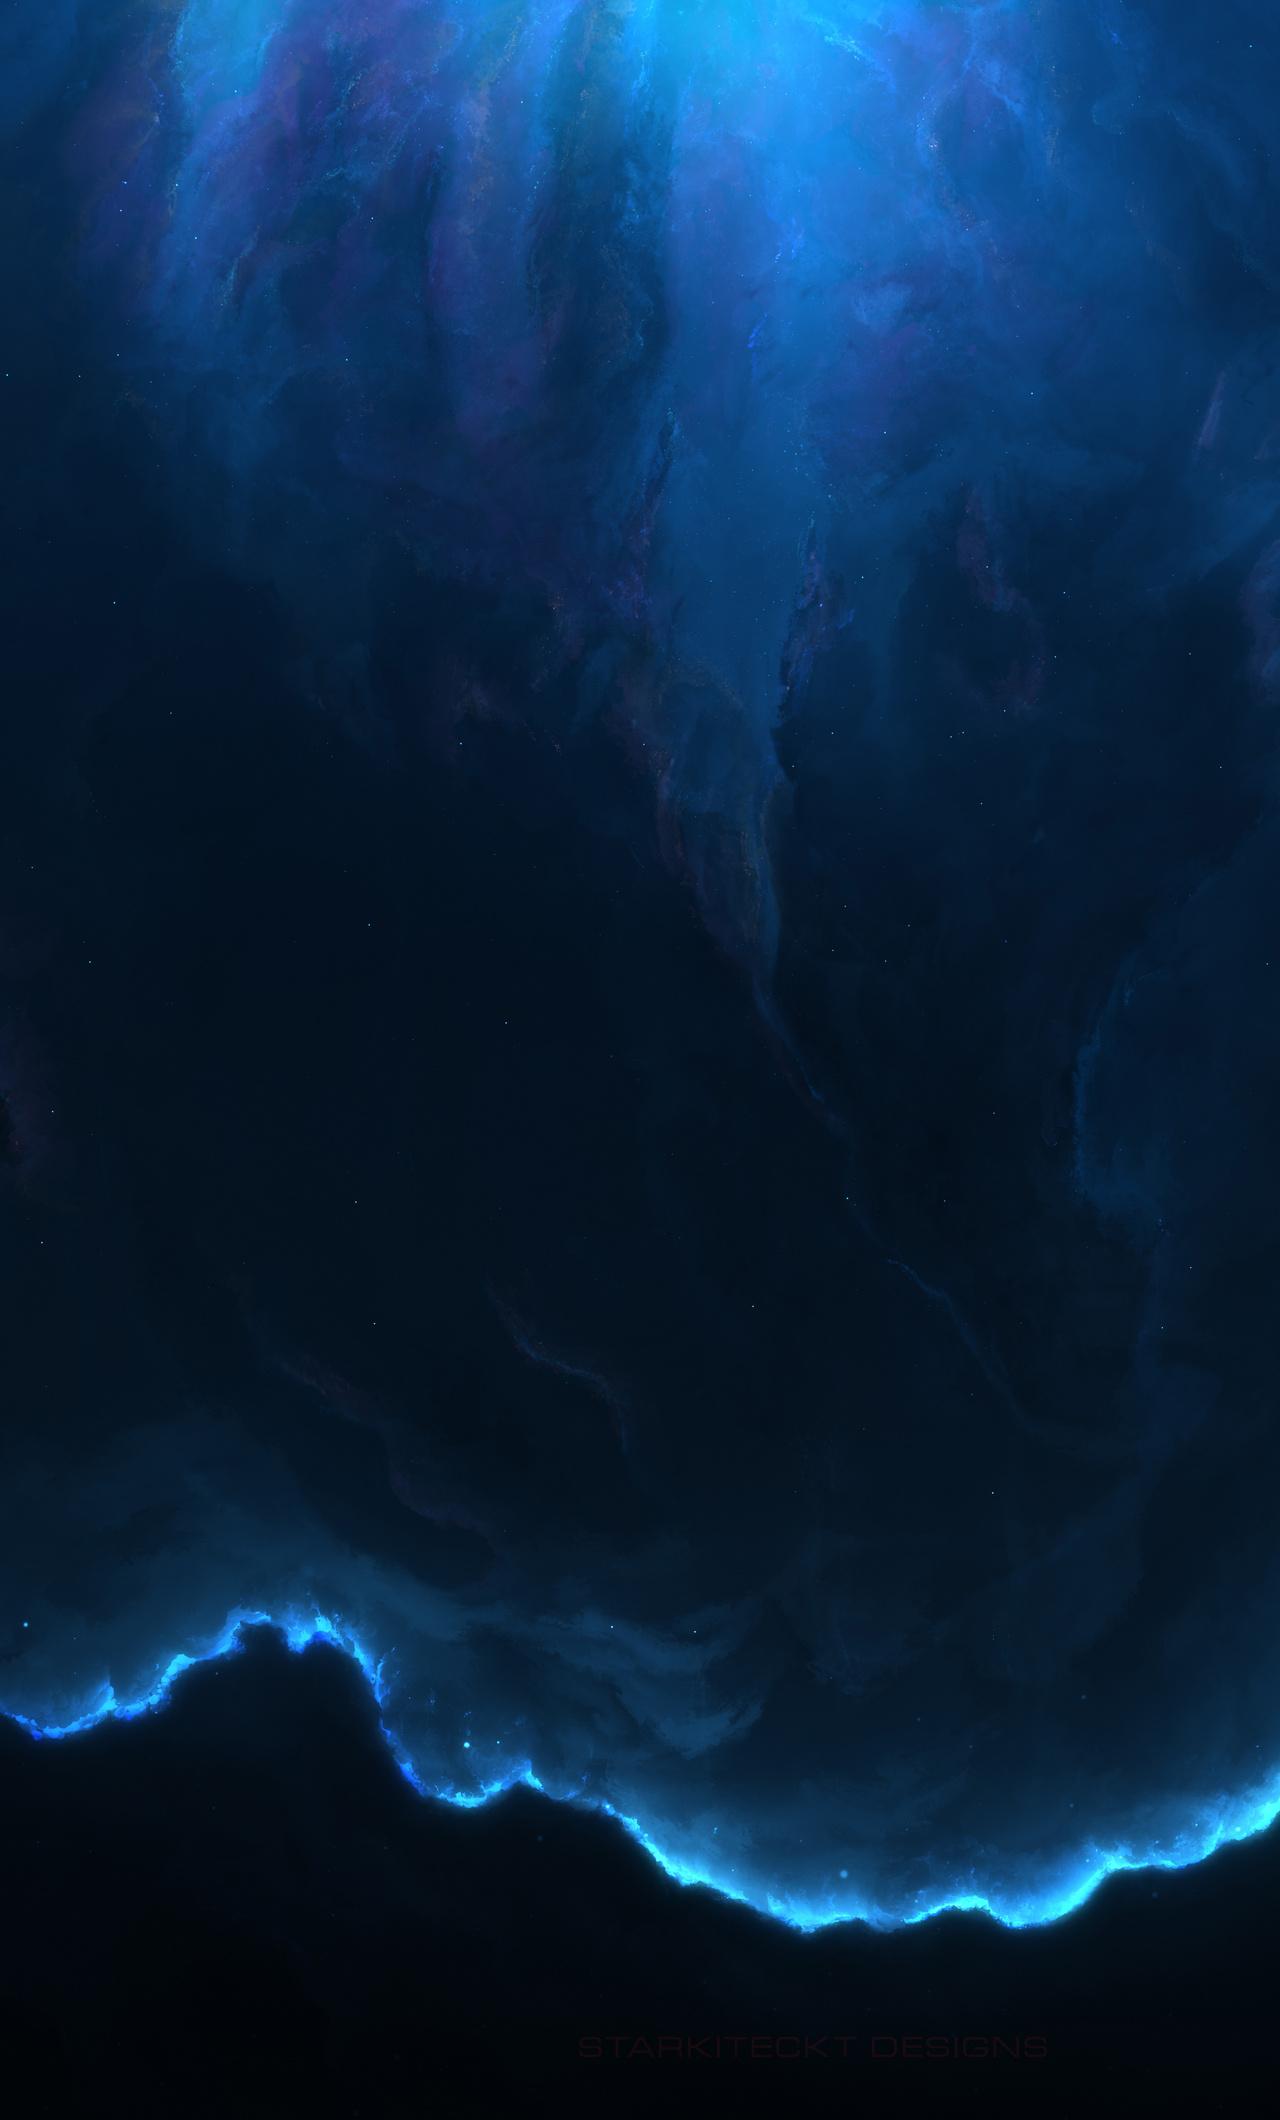 nebula-space-blue-12k-2v.jpg